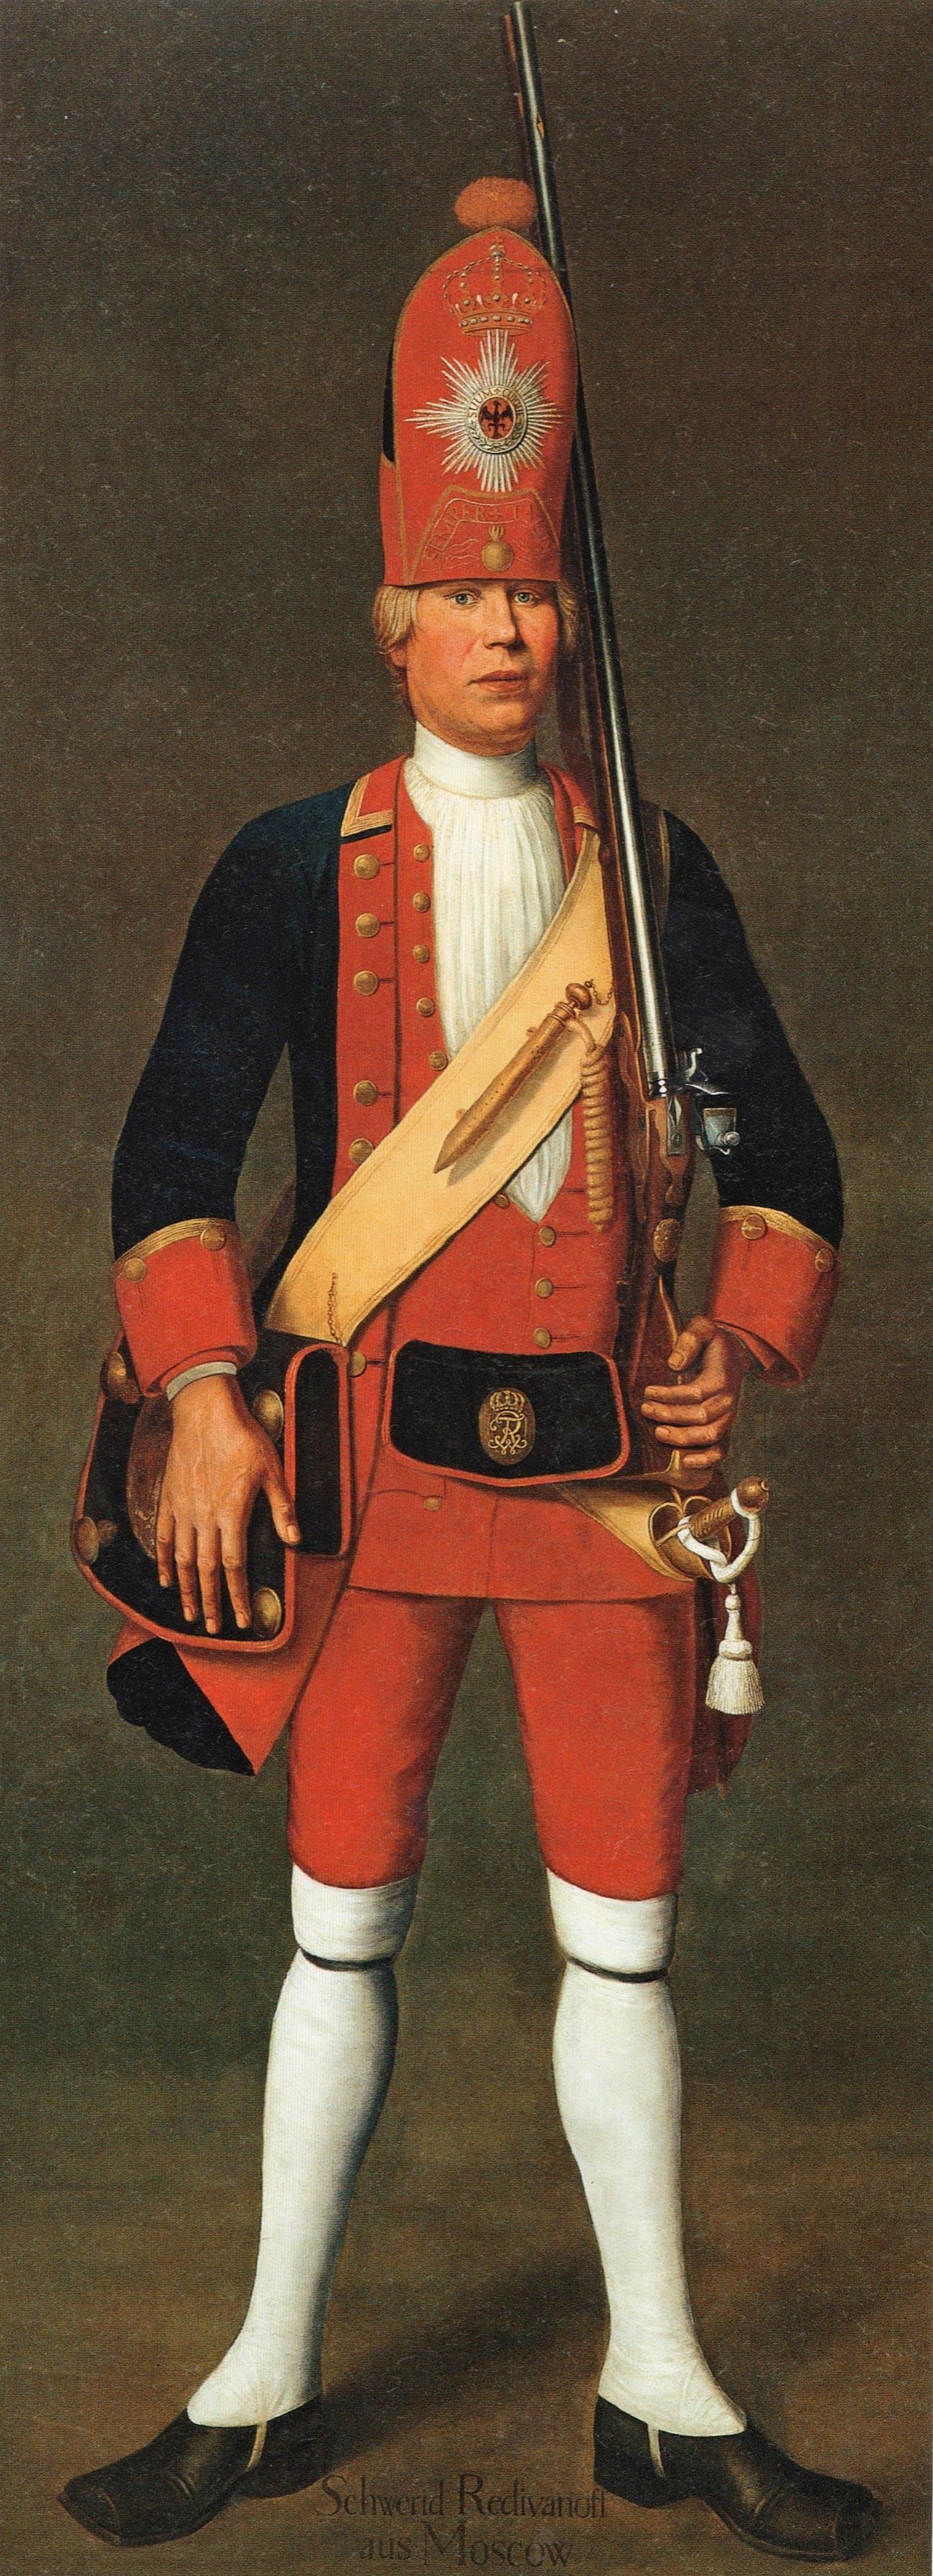 The portrait of Svirid Rodionov from Moscow of the Potsdam Giants by Johann Christof Merck